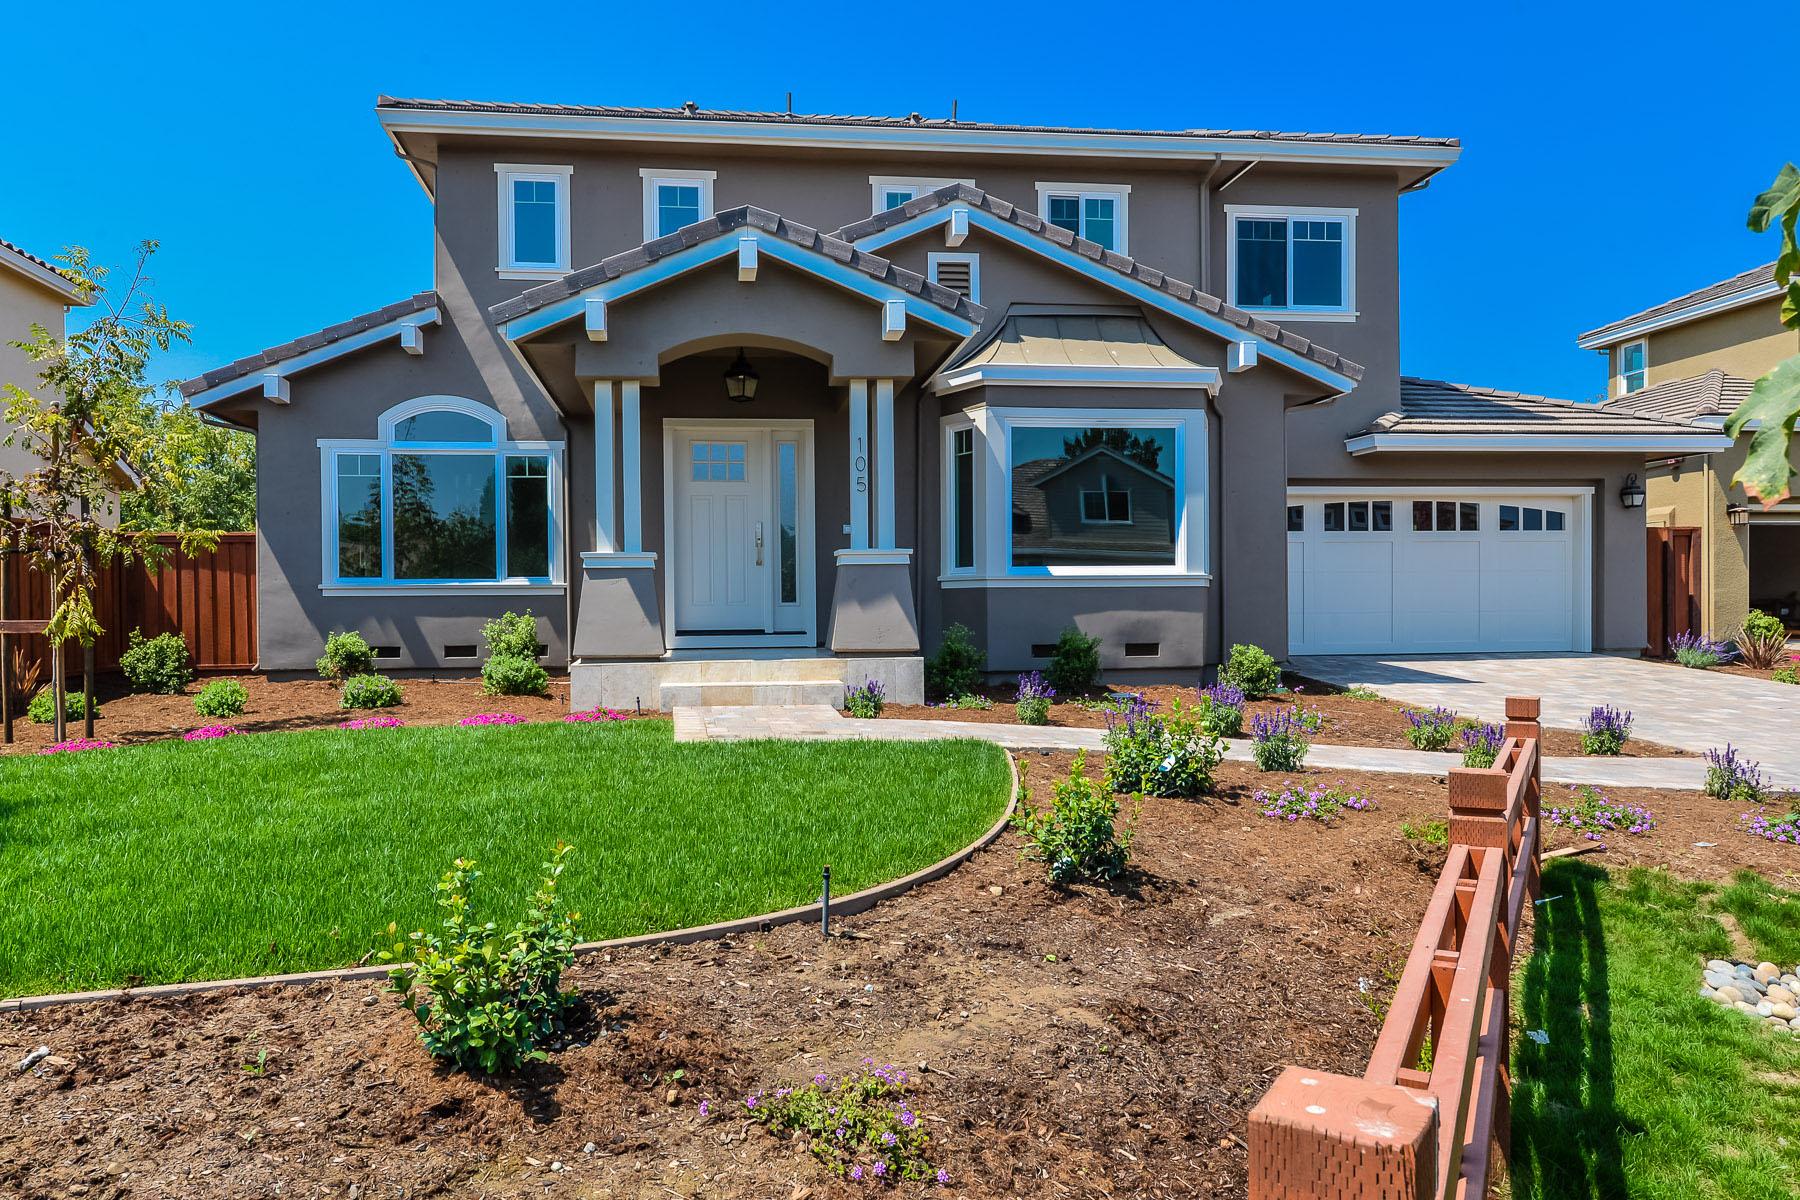 Property Rear01.jpg